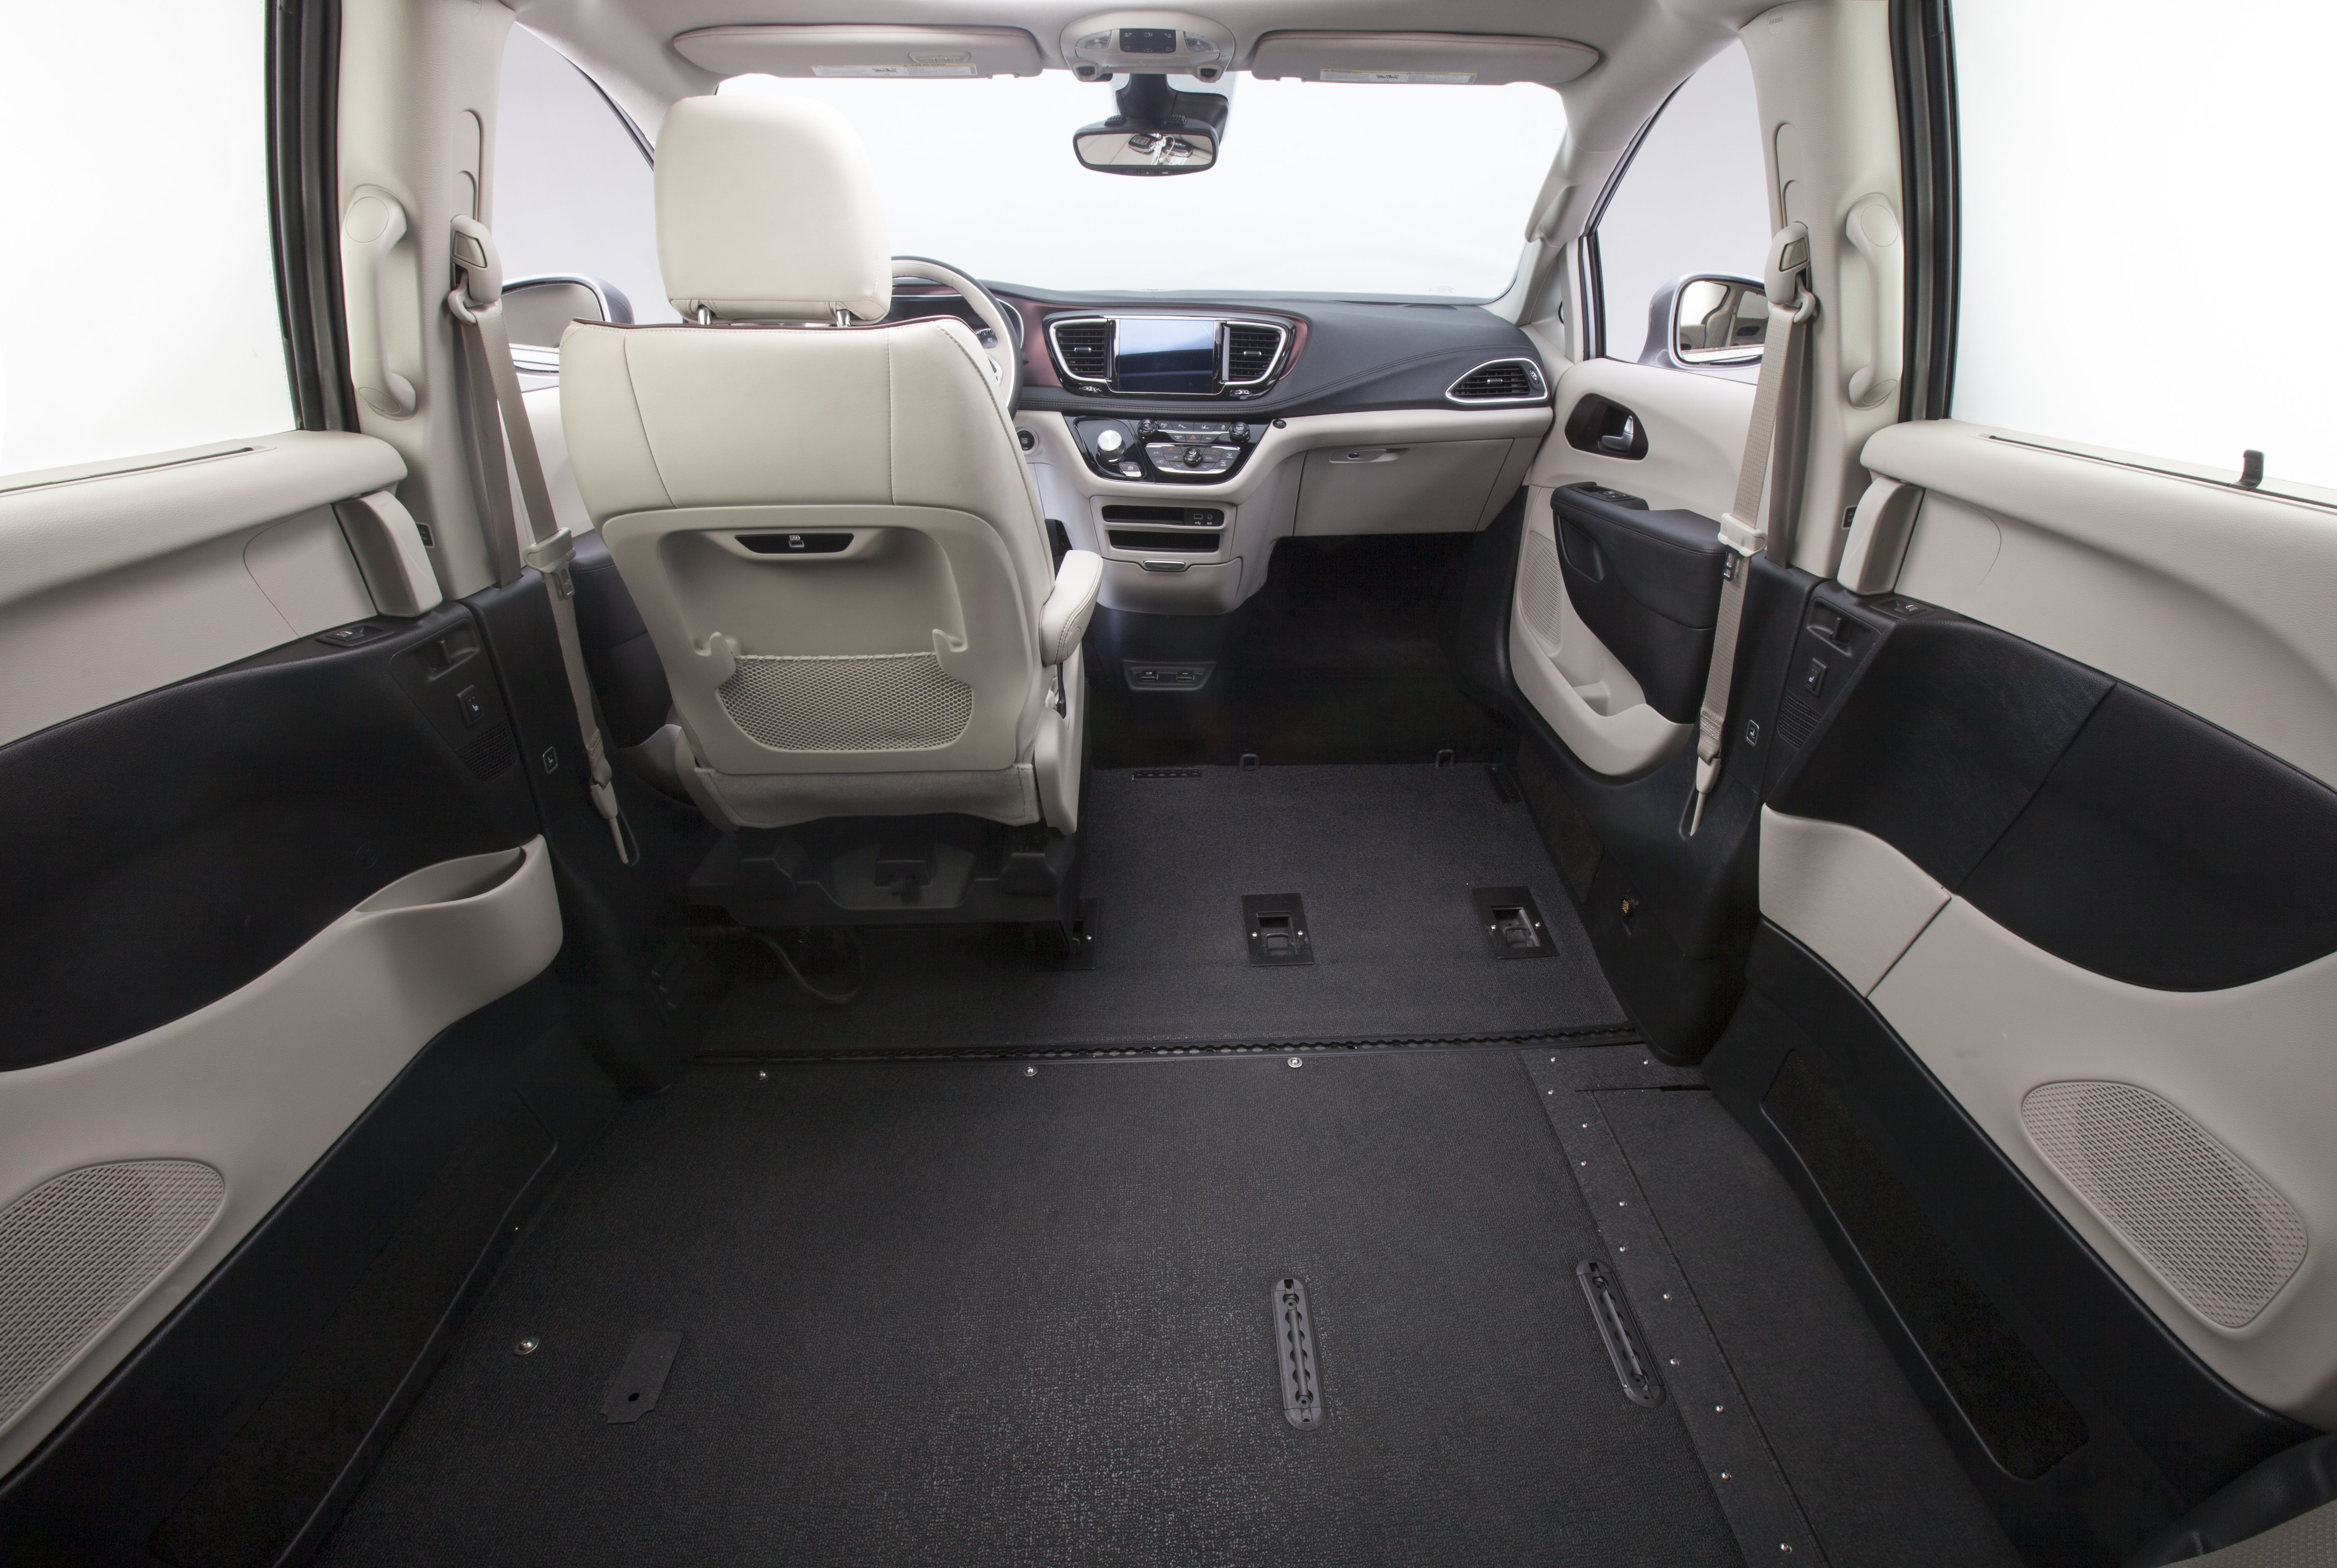 Chrysler Pacifica Interior 1 659 2016 Nov 4 Jpg 5555 3728